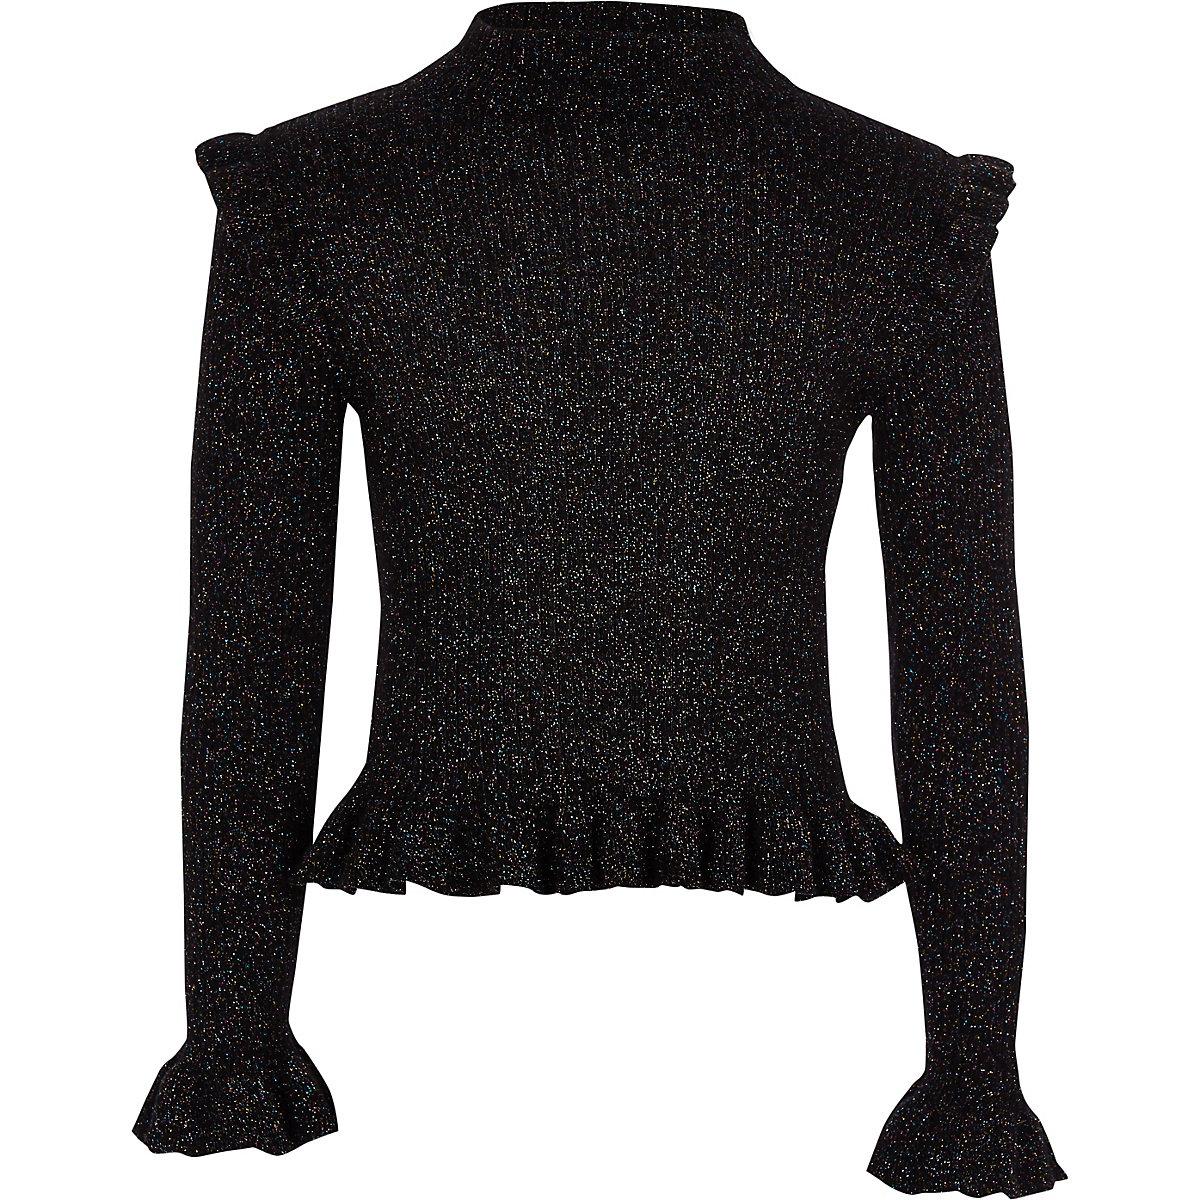 Girls black frill high neck sweater